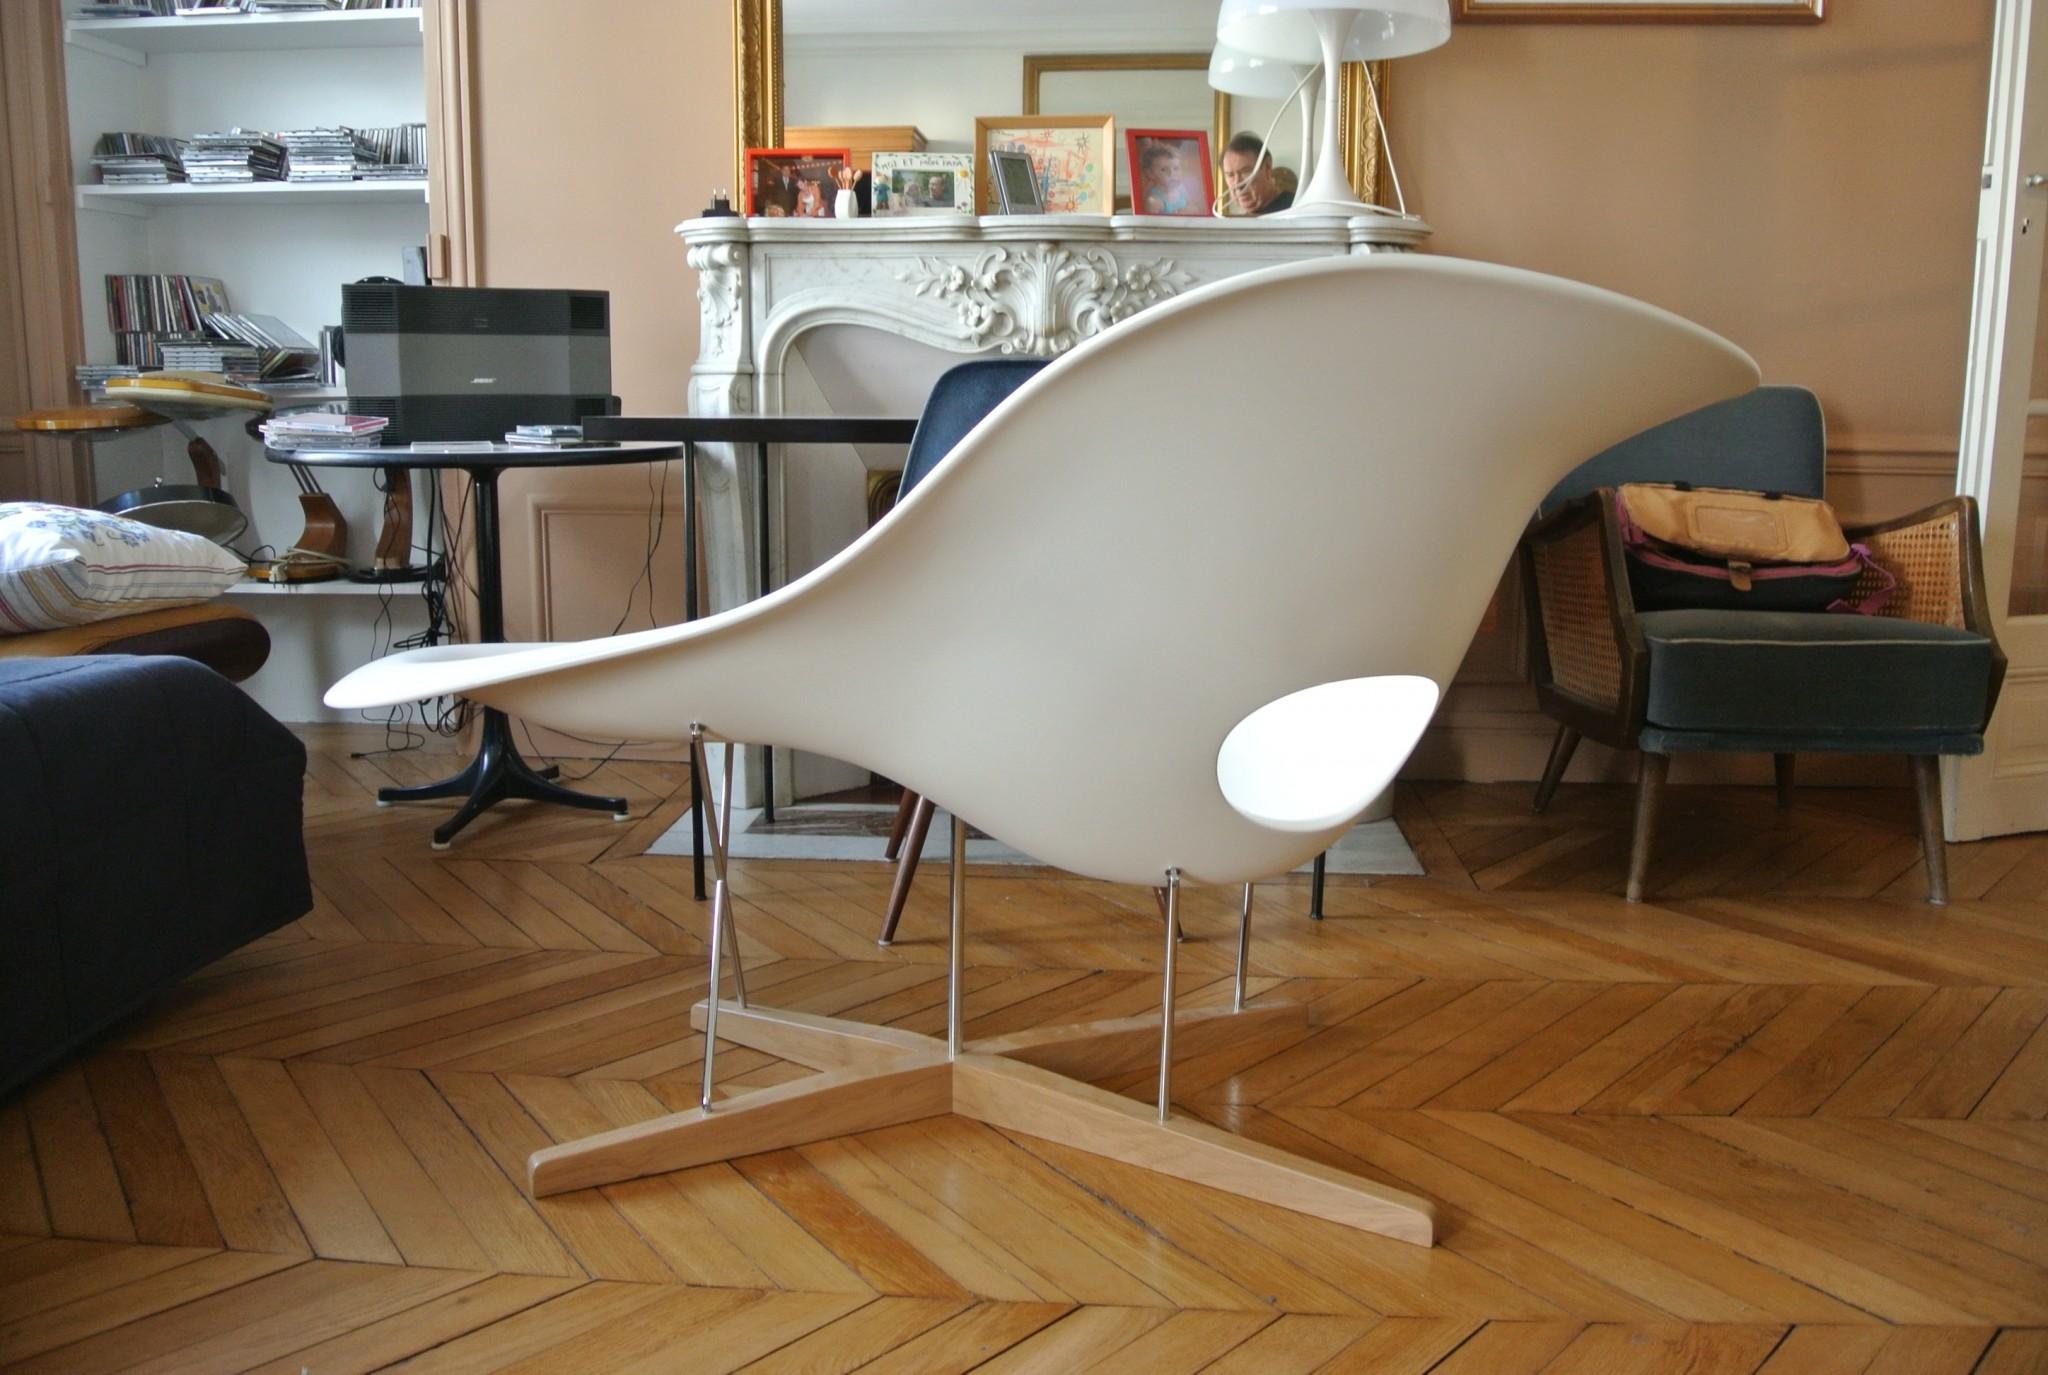 squarcina vitra la chaise squarcina. Black Bedroom Furniture Sets. Home Design Ideas